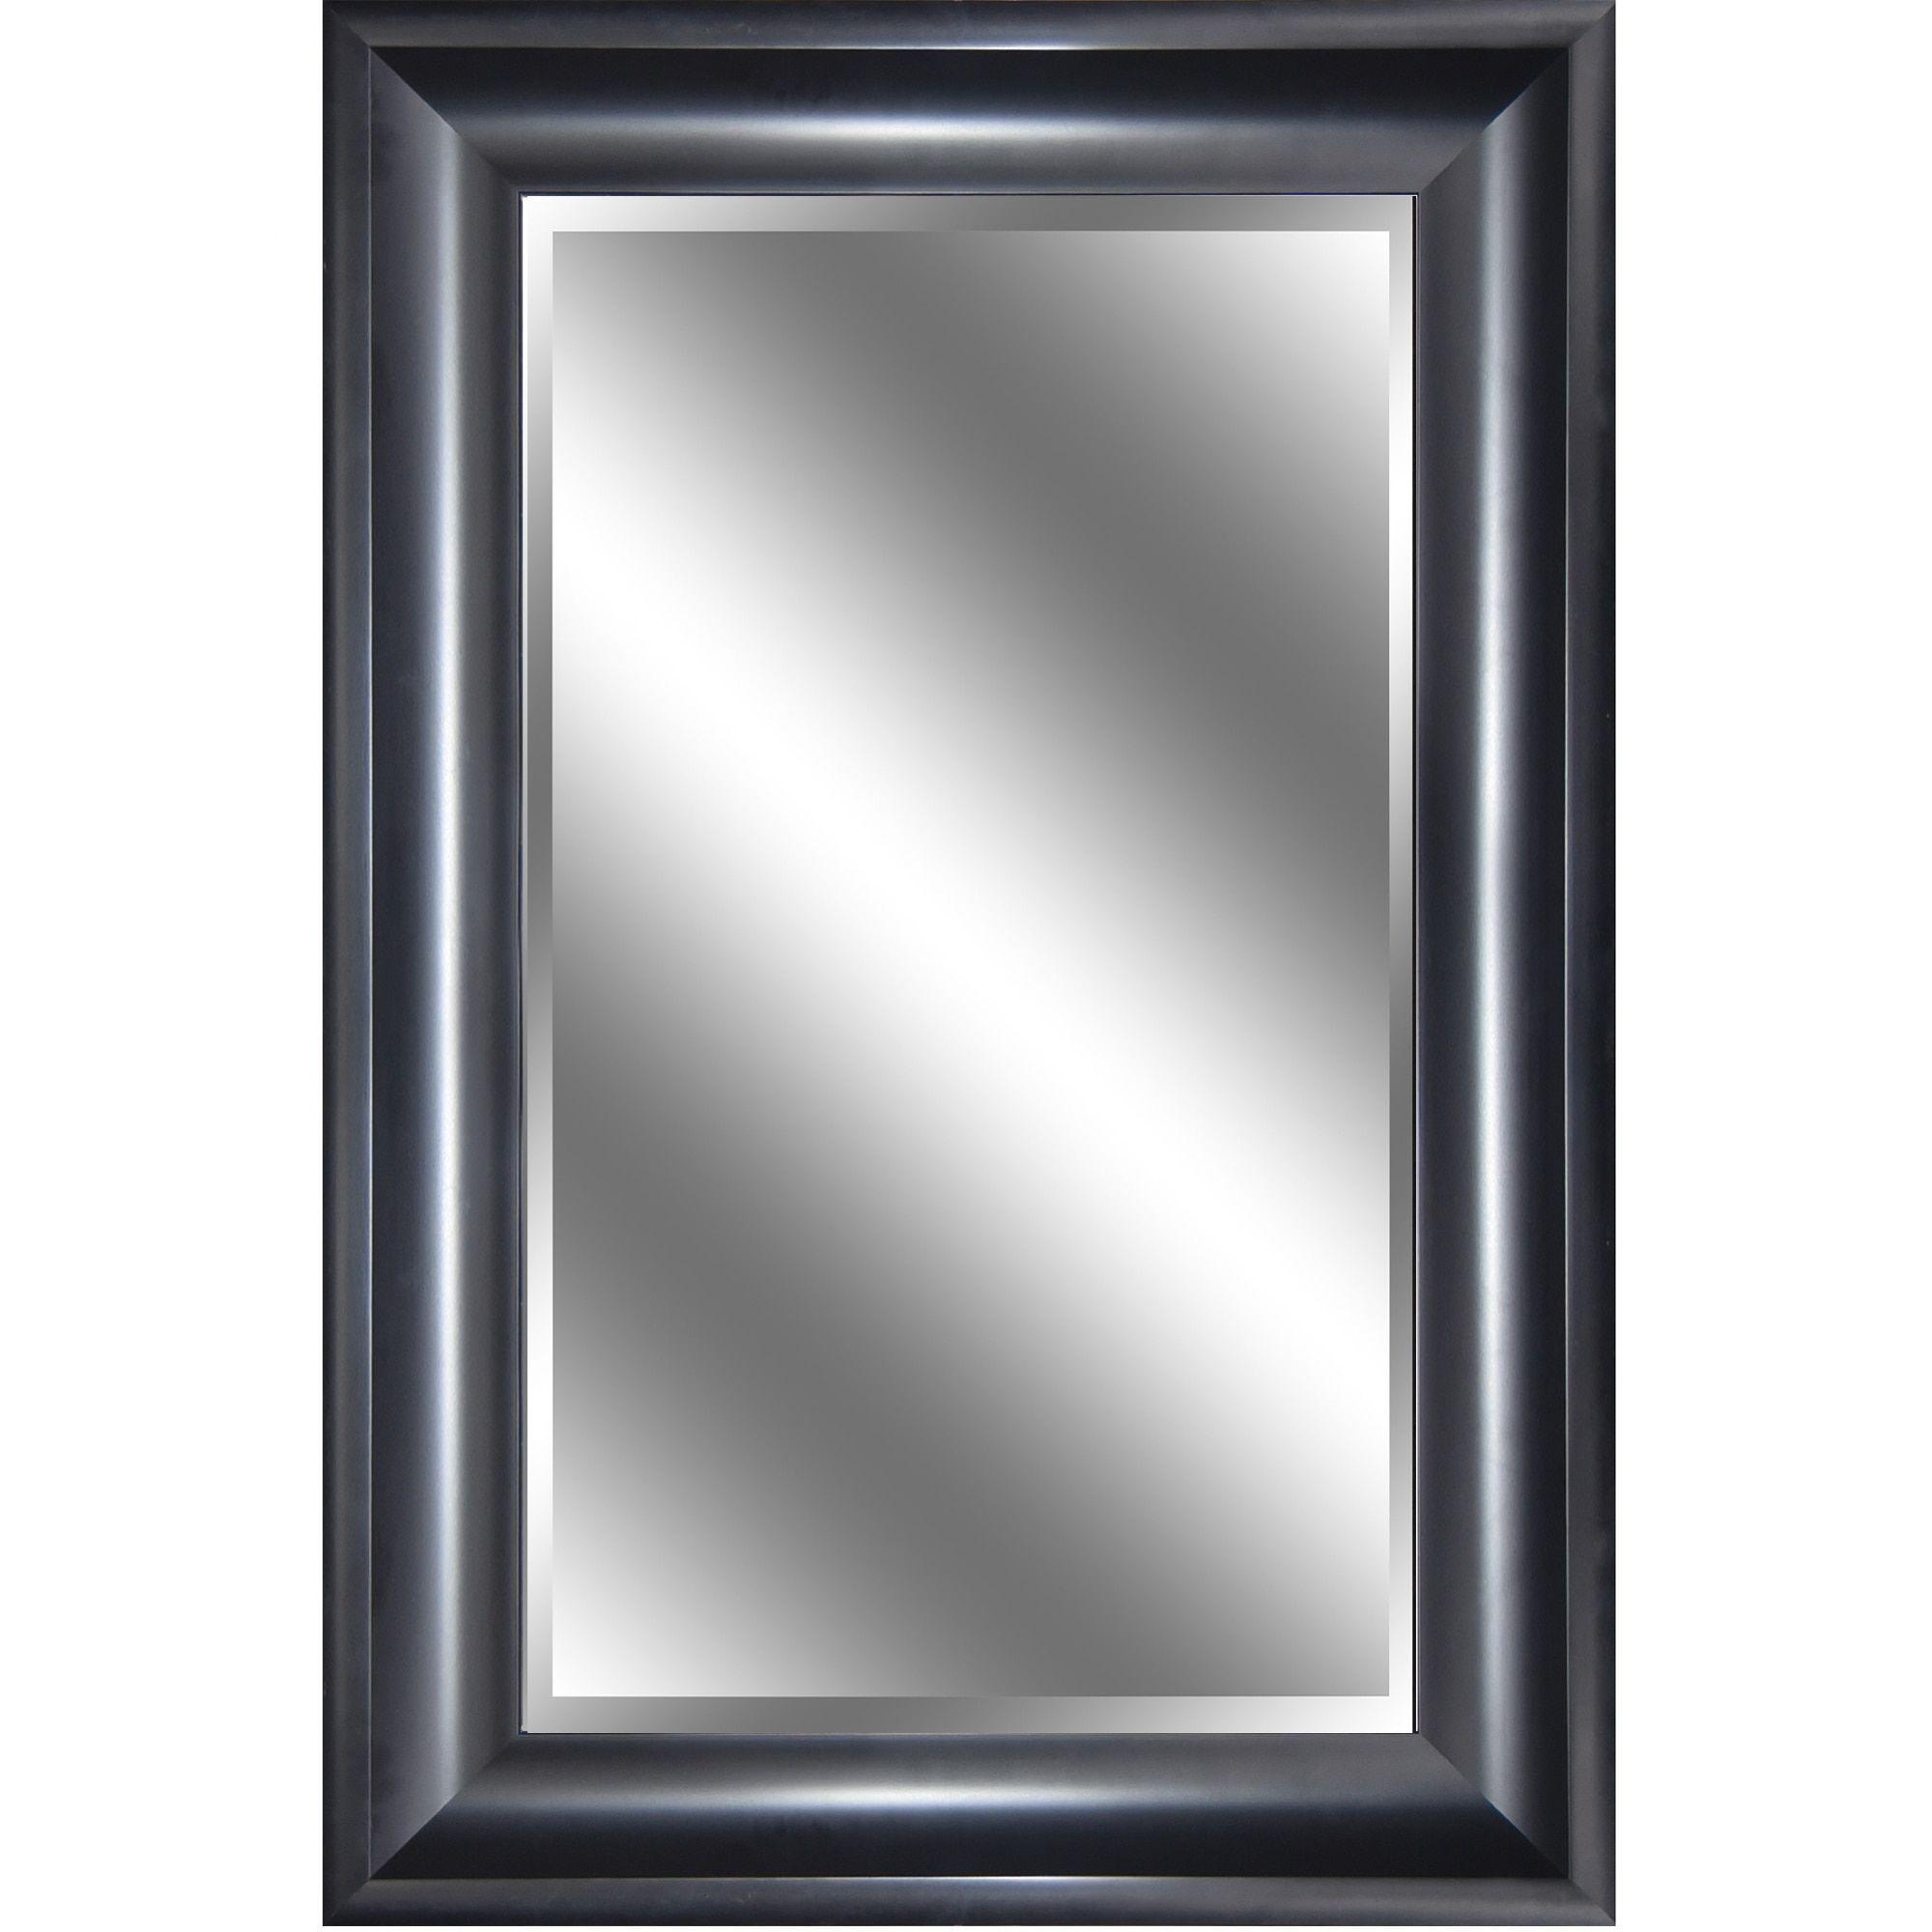 Y-Decor Reflection 24 x 36 x 1-inch Bevel Mirror with 3.75-inch ...